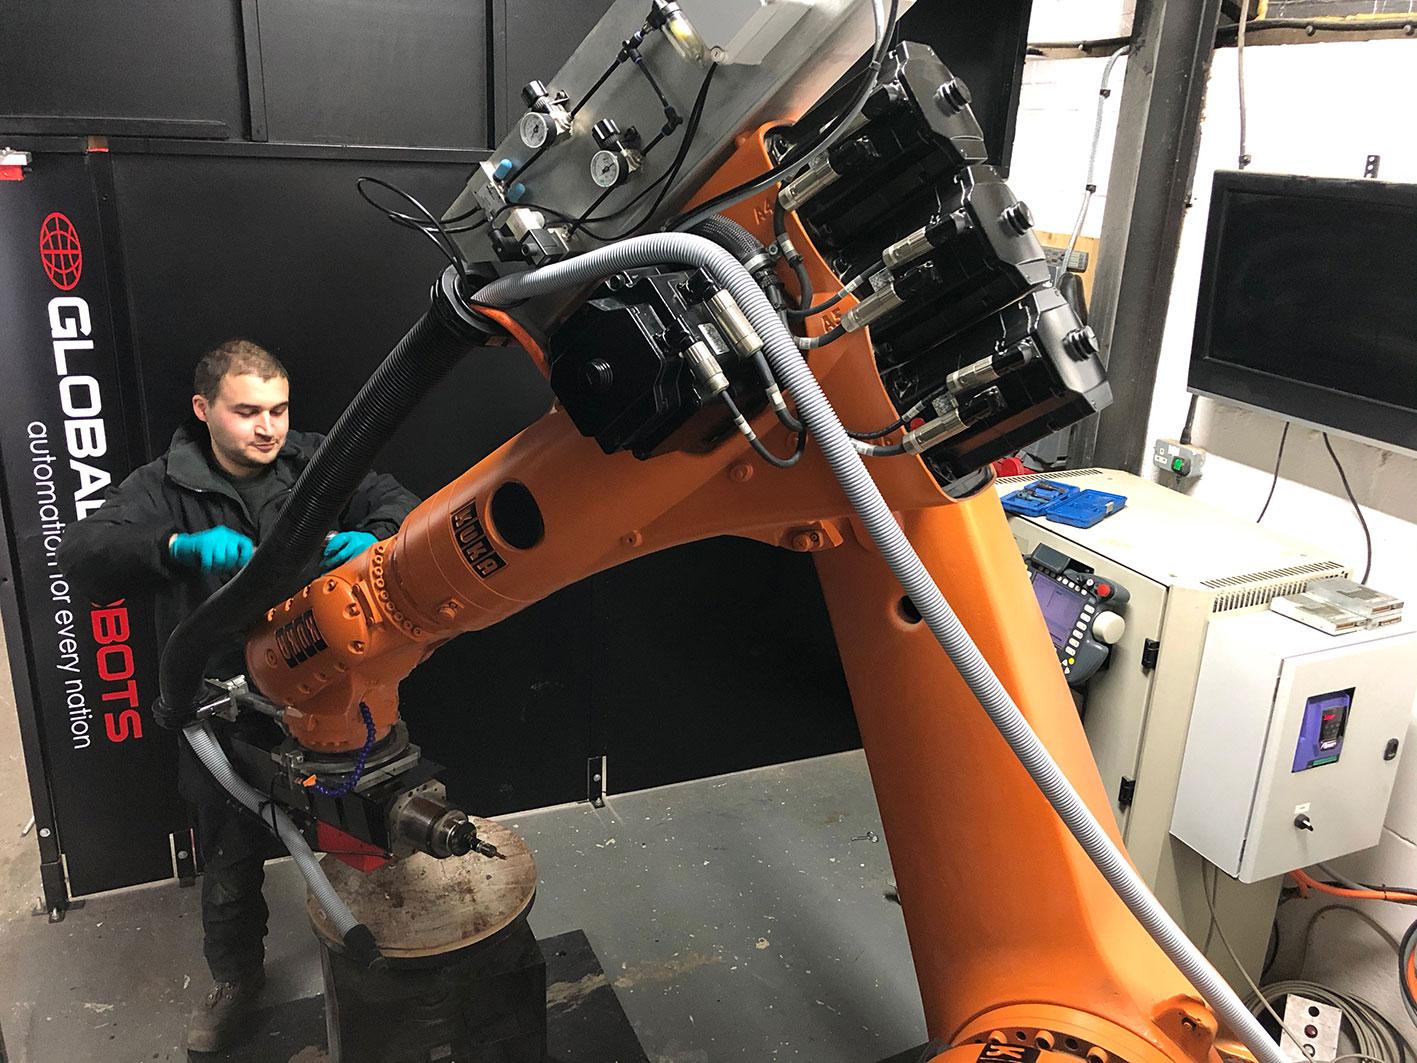 Robotic Servicing